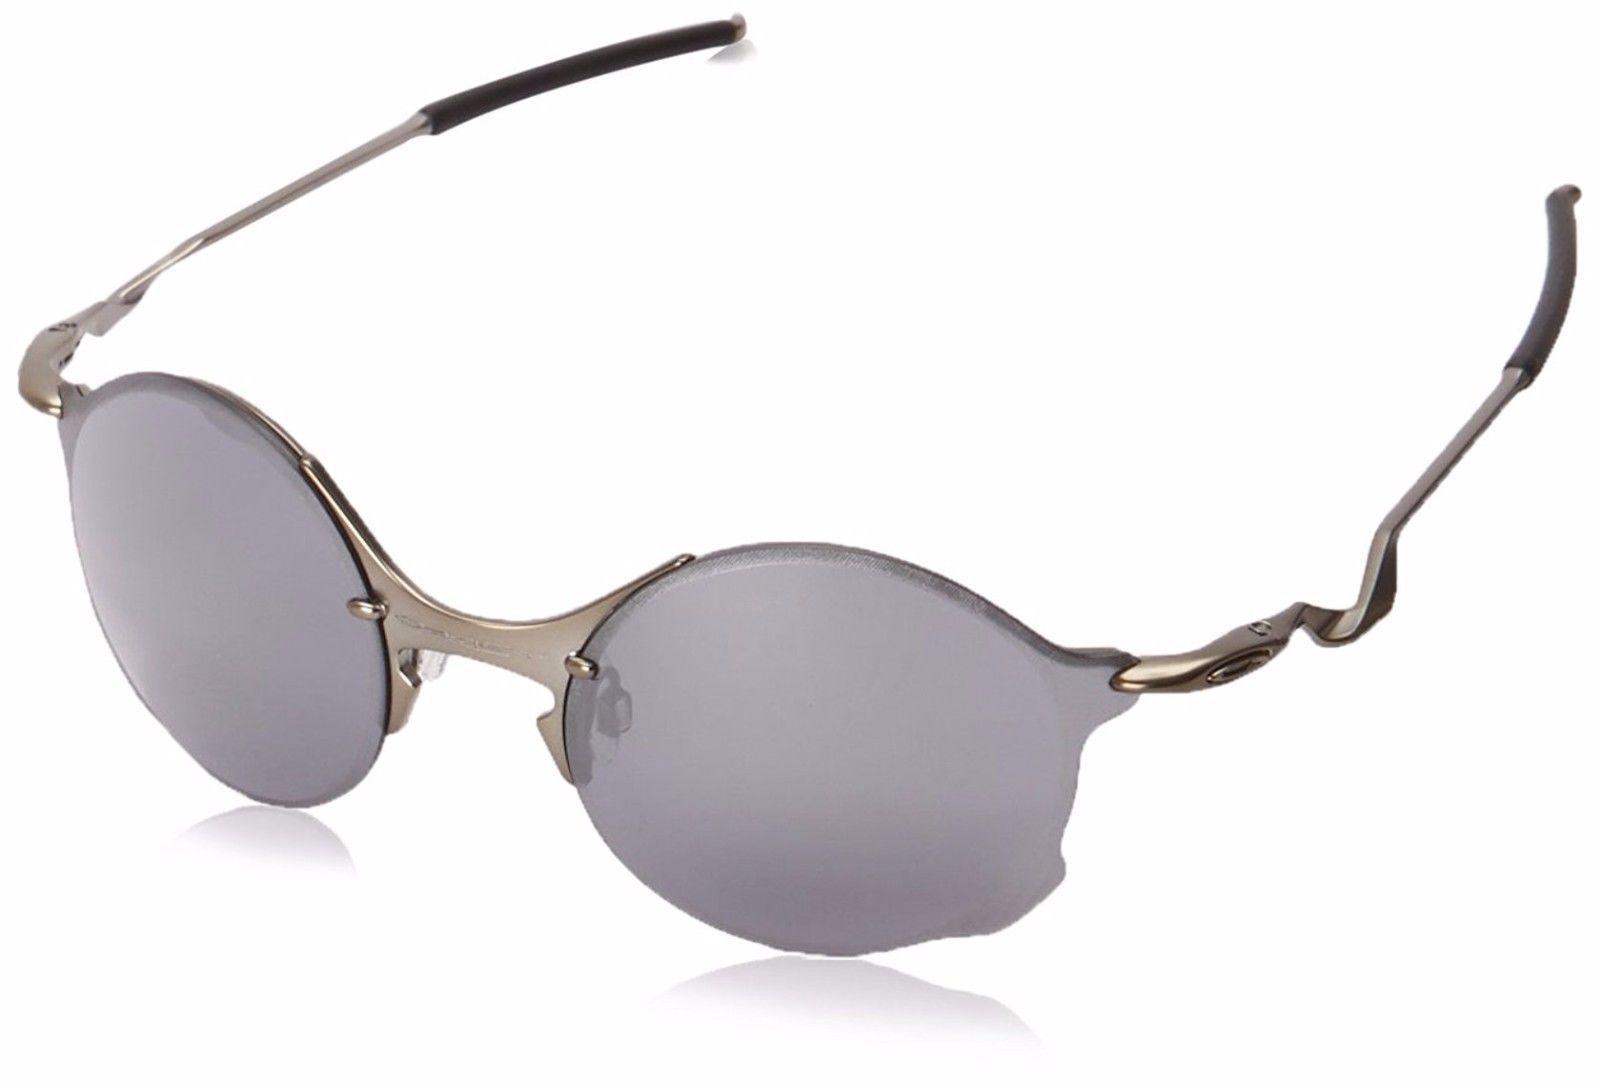 f4ec4ec660fd5 New OAKLEY TAILEND - Titanium Frame w  Black Iridium Lens Sunglasses  OO4088-01